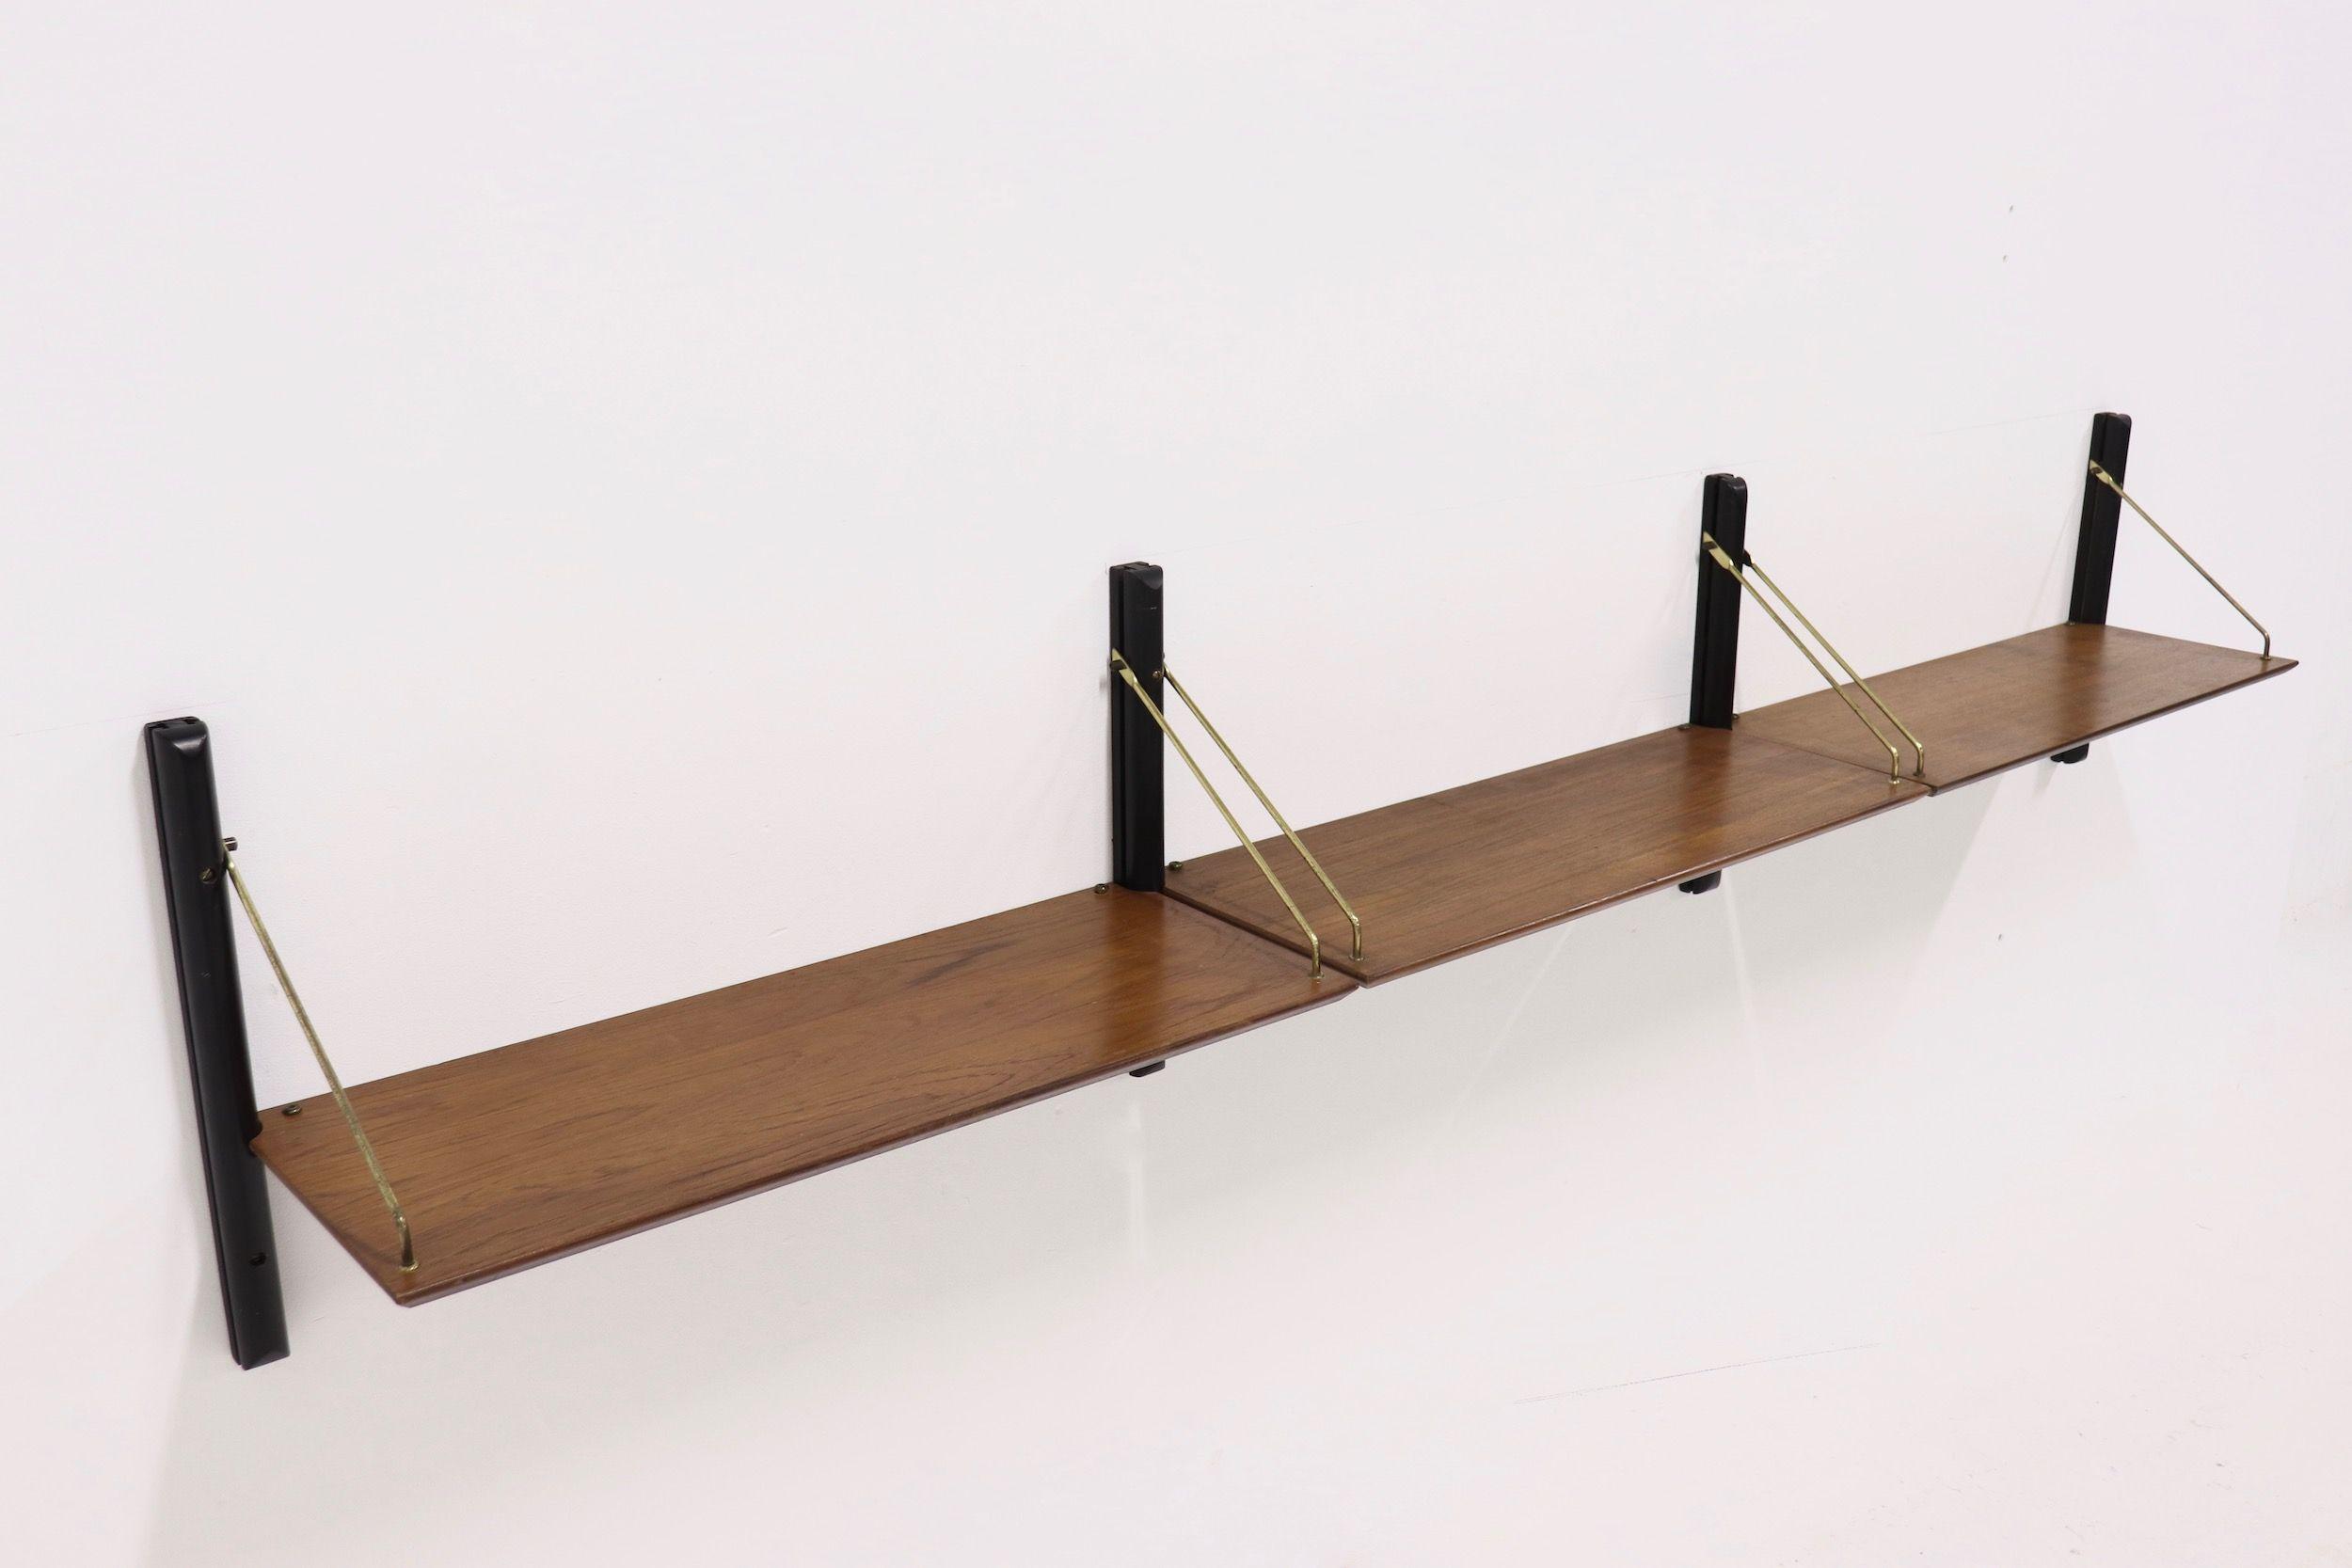 Rare Mid Century Teak Shelving Unit By Louis Van Teeffelen For Webe 1950 S